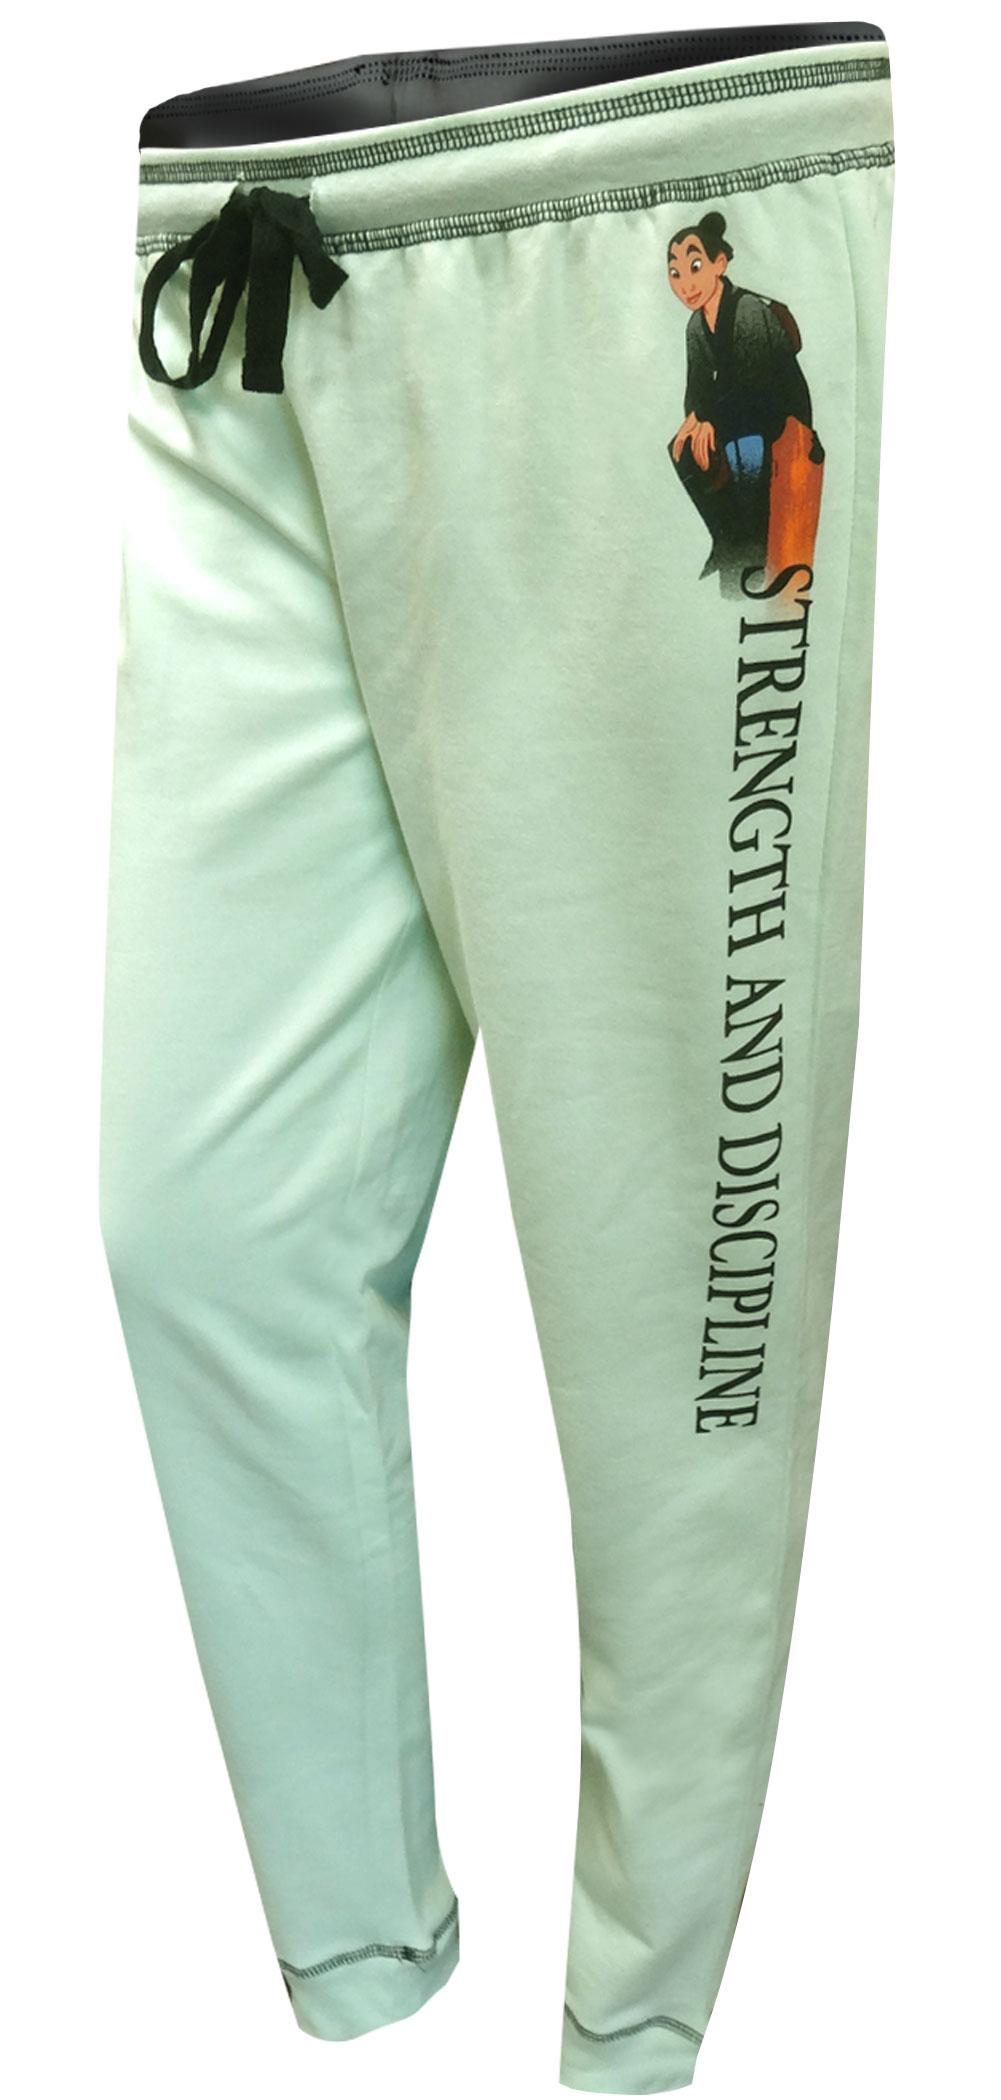 Image of Disney Mulan Strength and Discipline Jogger Lounge Pants for women